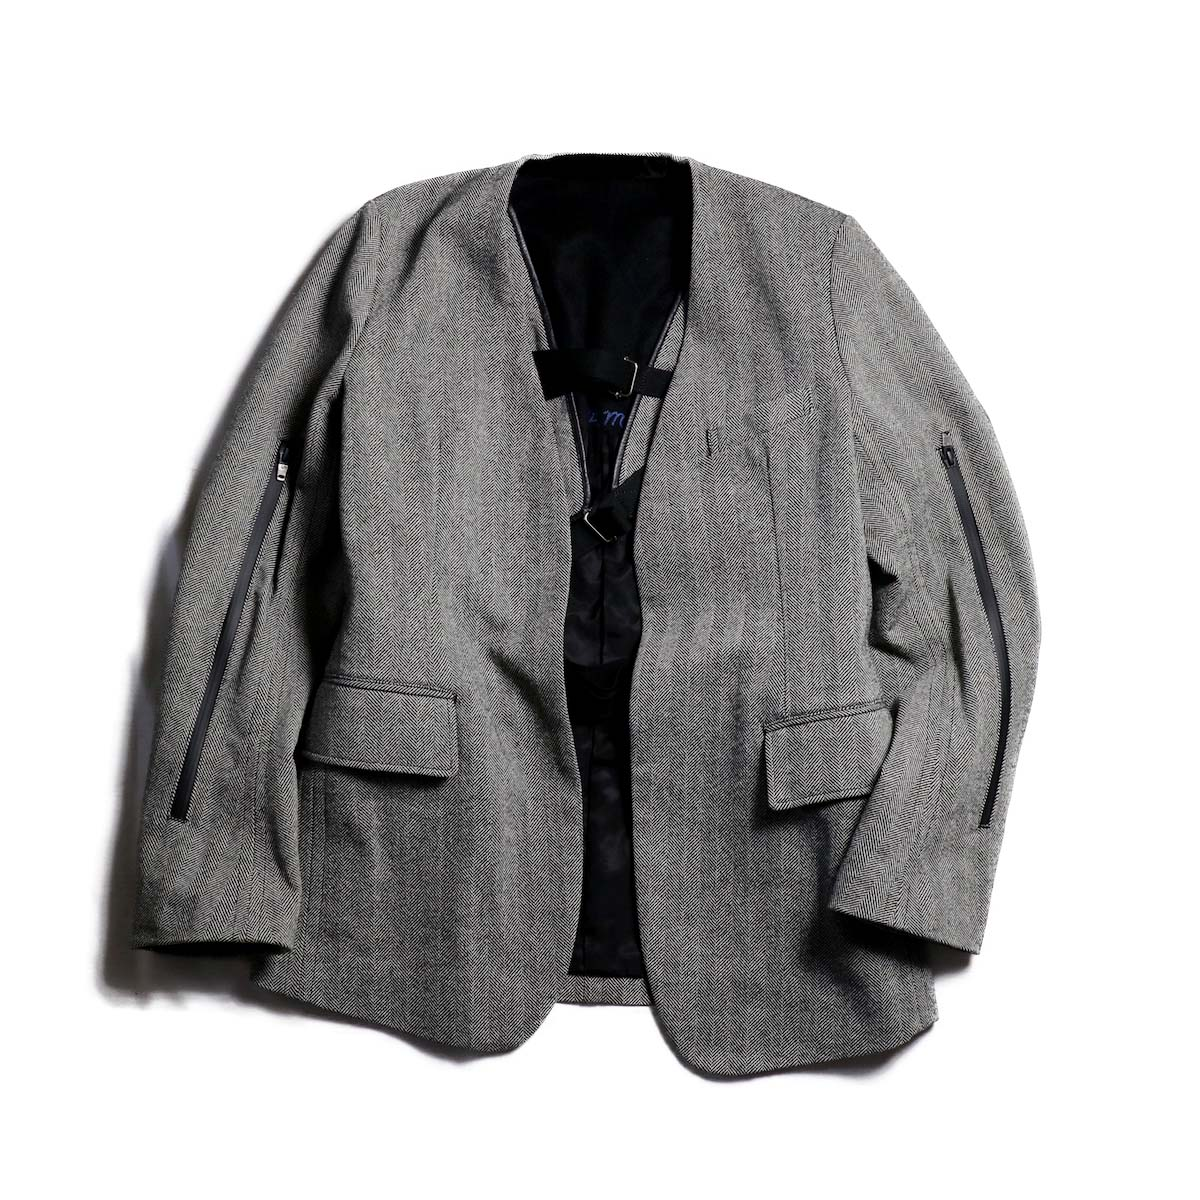 TheSoloist / sj.0003dAW18 collarless jacket. (herringbone)